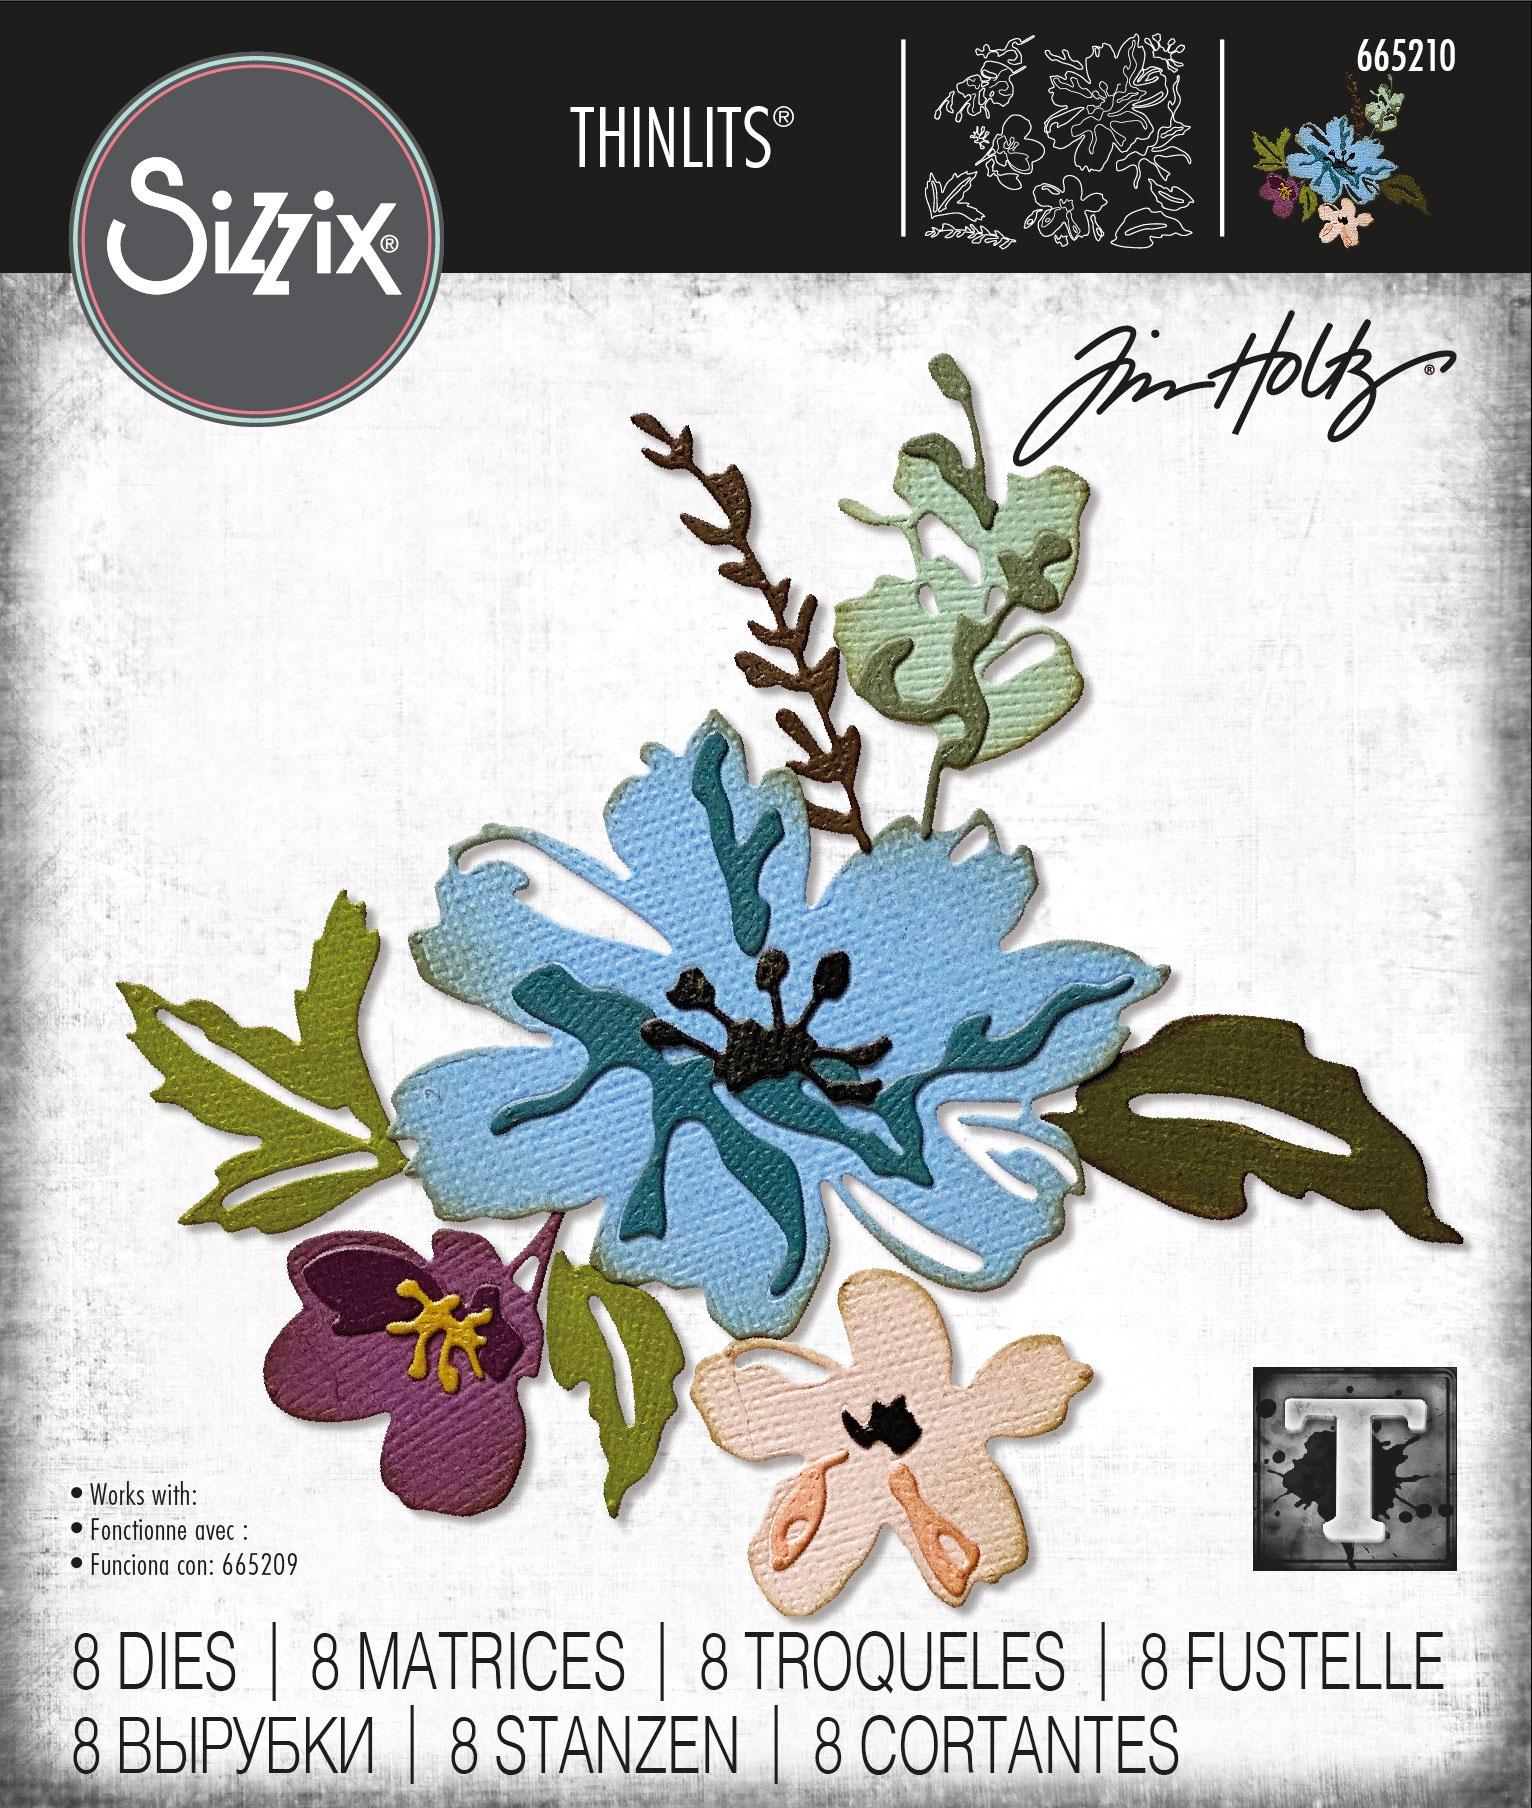 Sizzix Thinlits Dies By Tim Holtz -Brushstroke Flowers #2